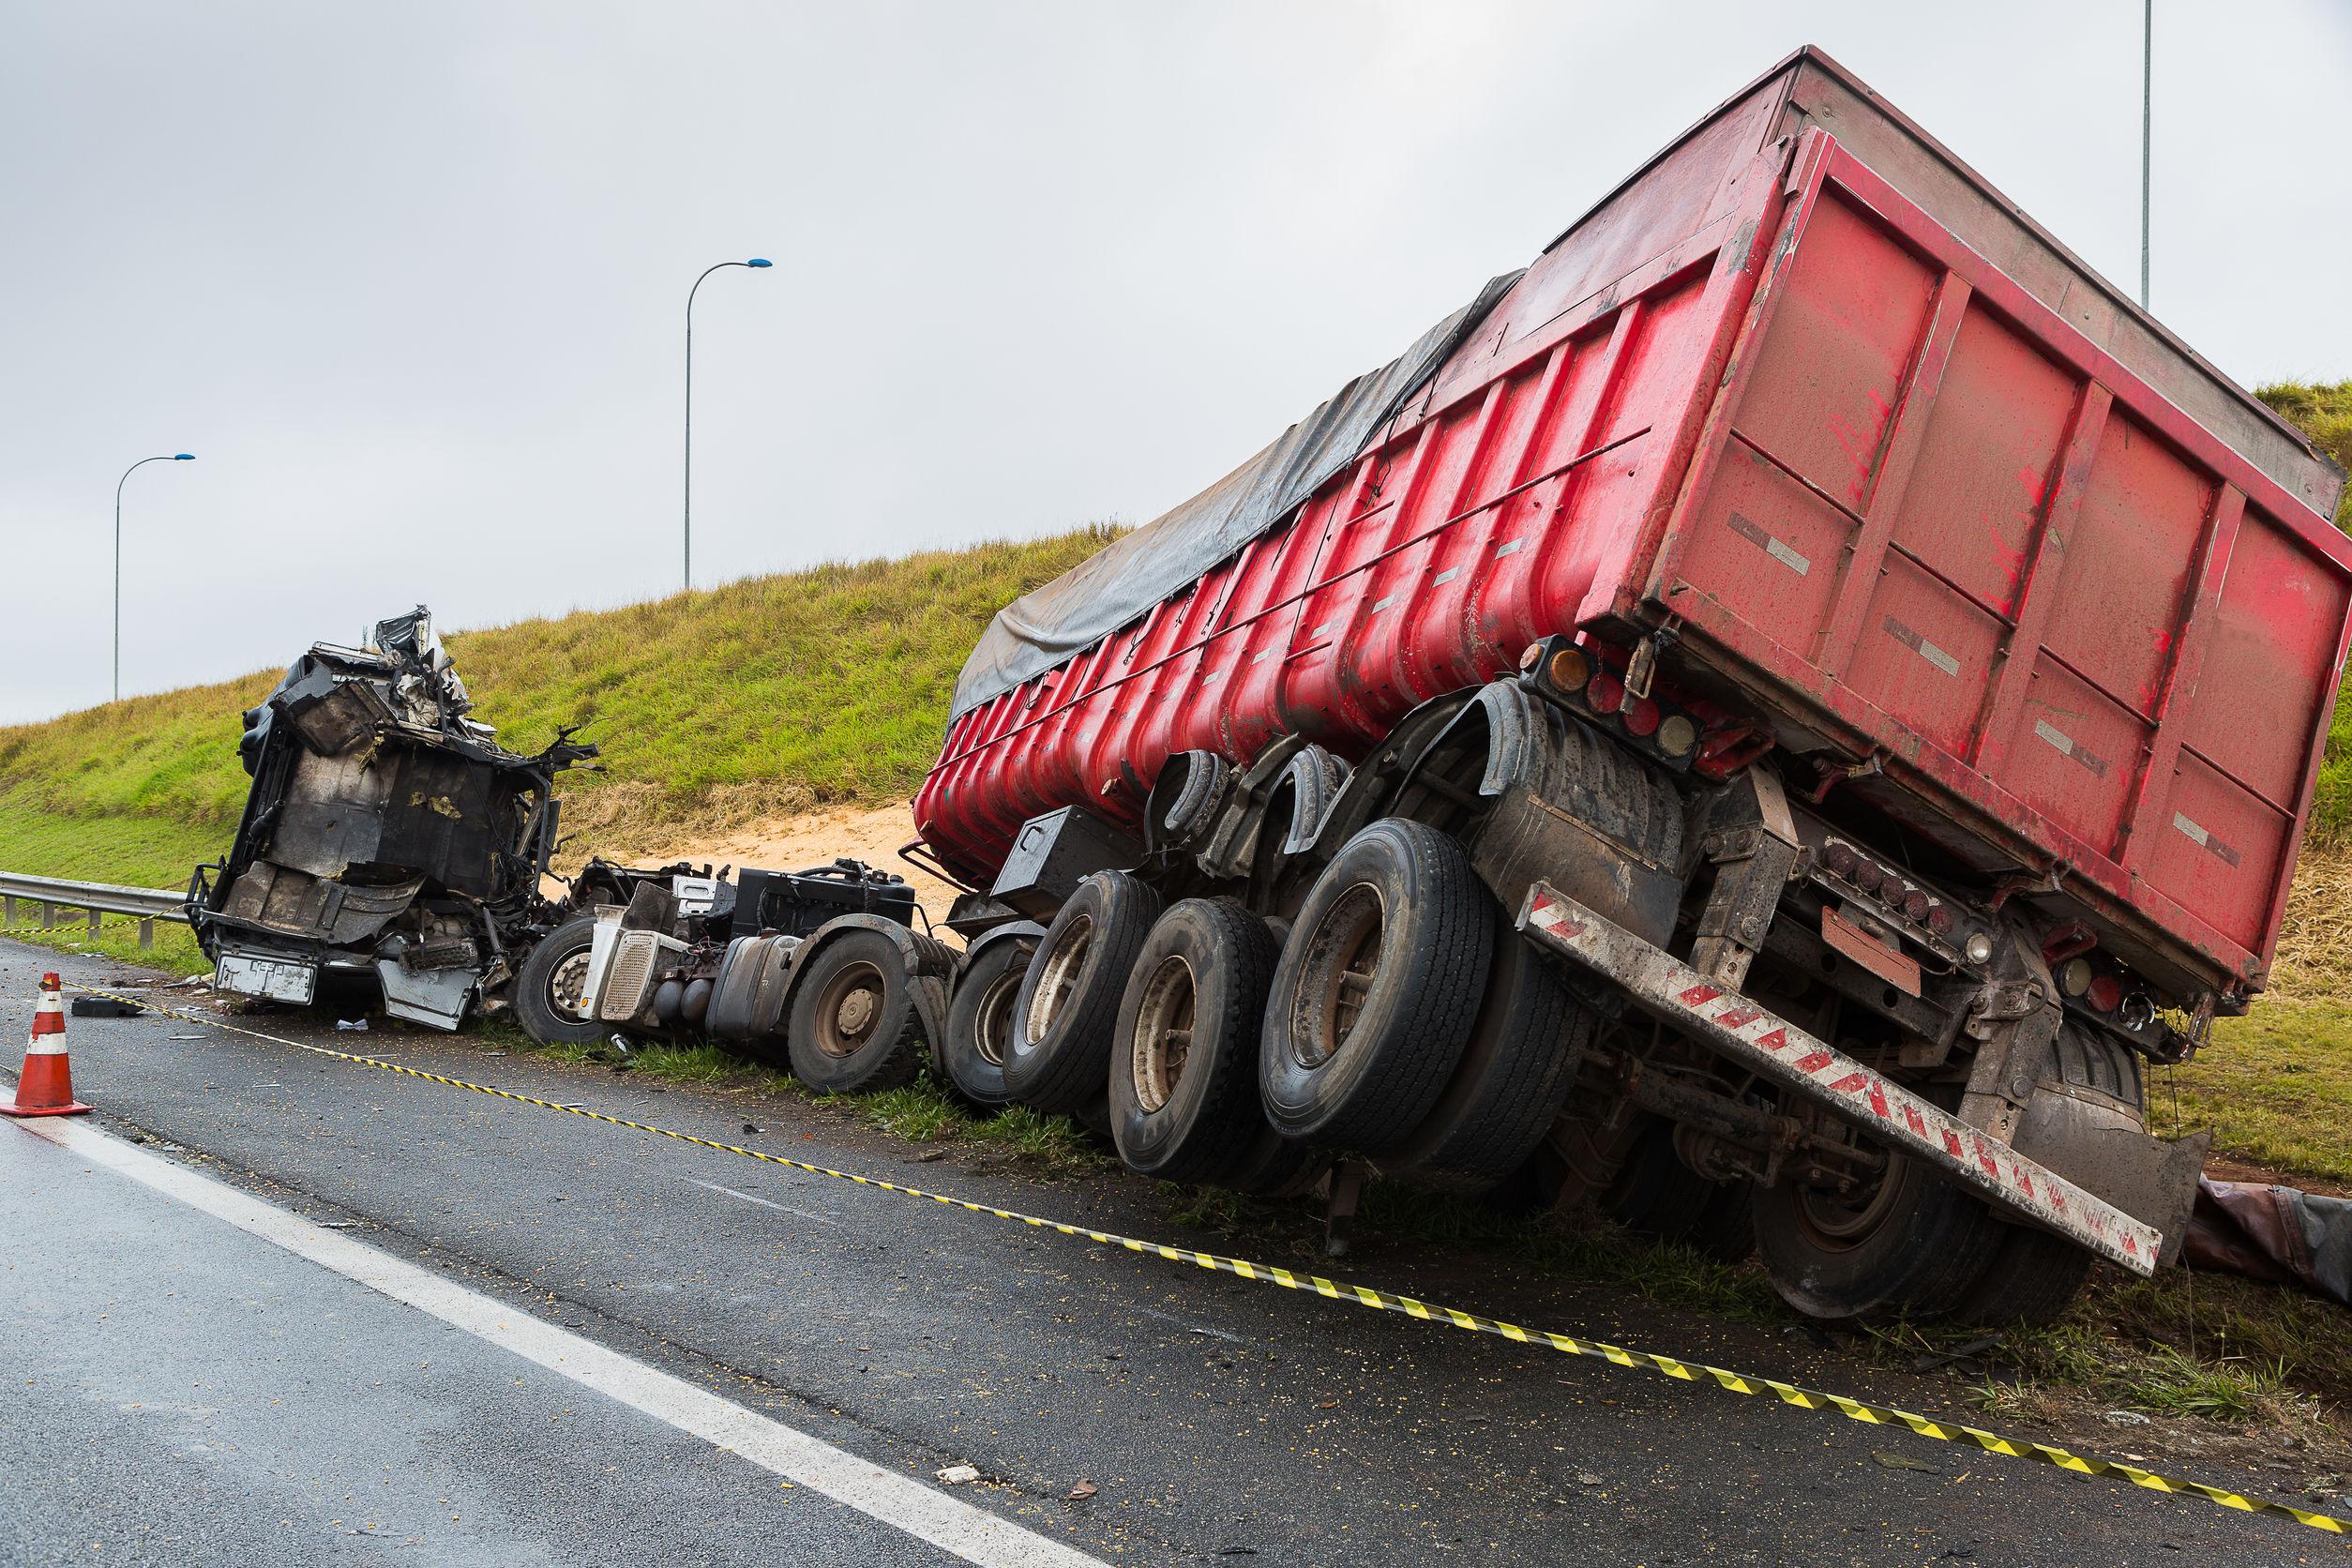 More carnage on Australia's roads